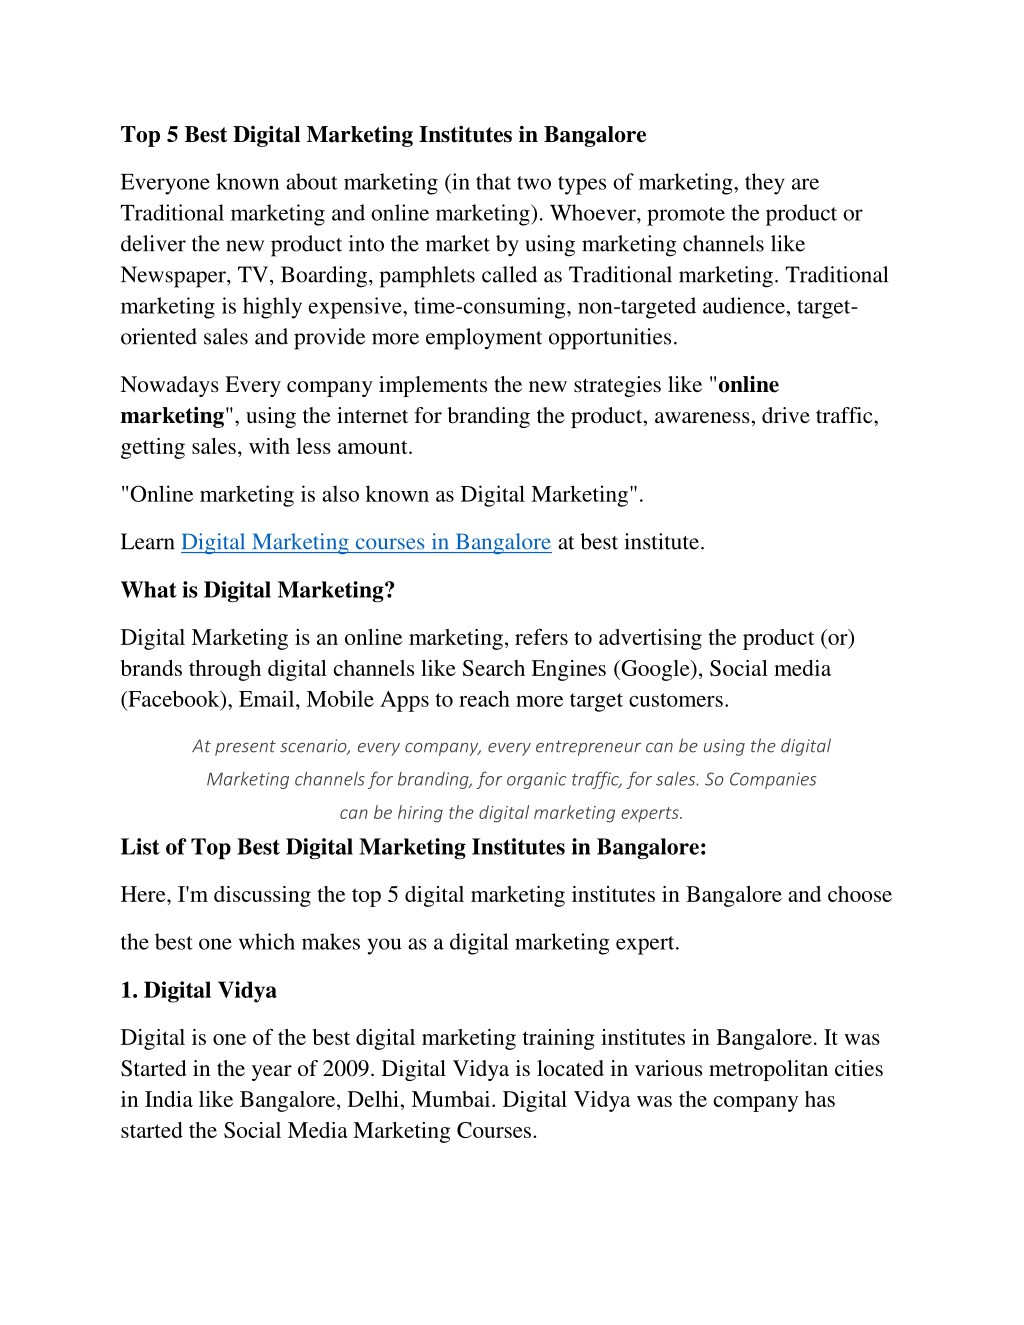 PPT - Top 5 Best Digital Marketing Institutes in Bangalore